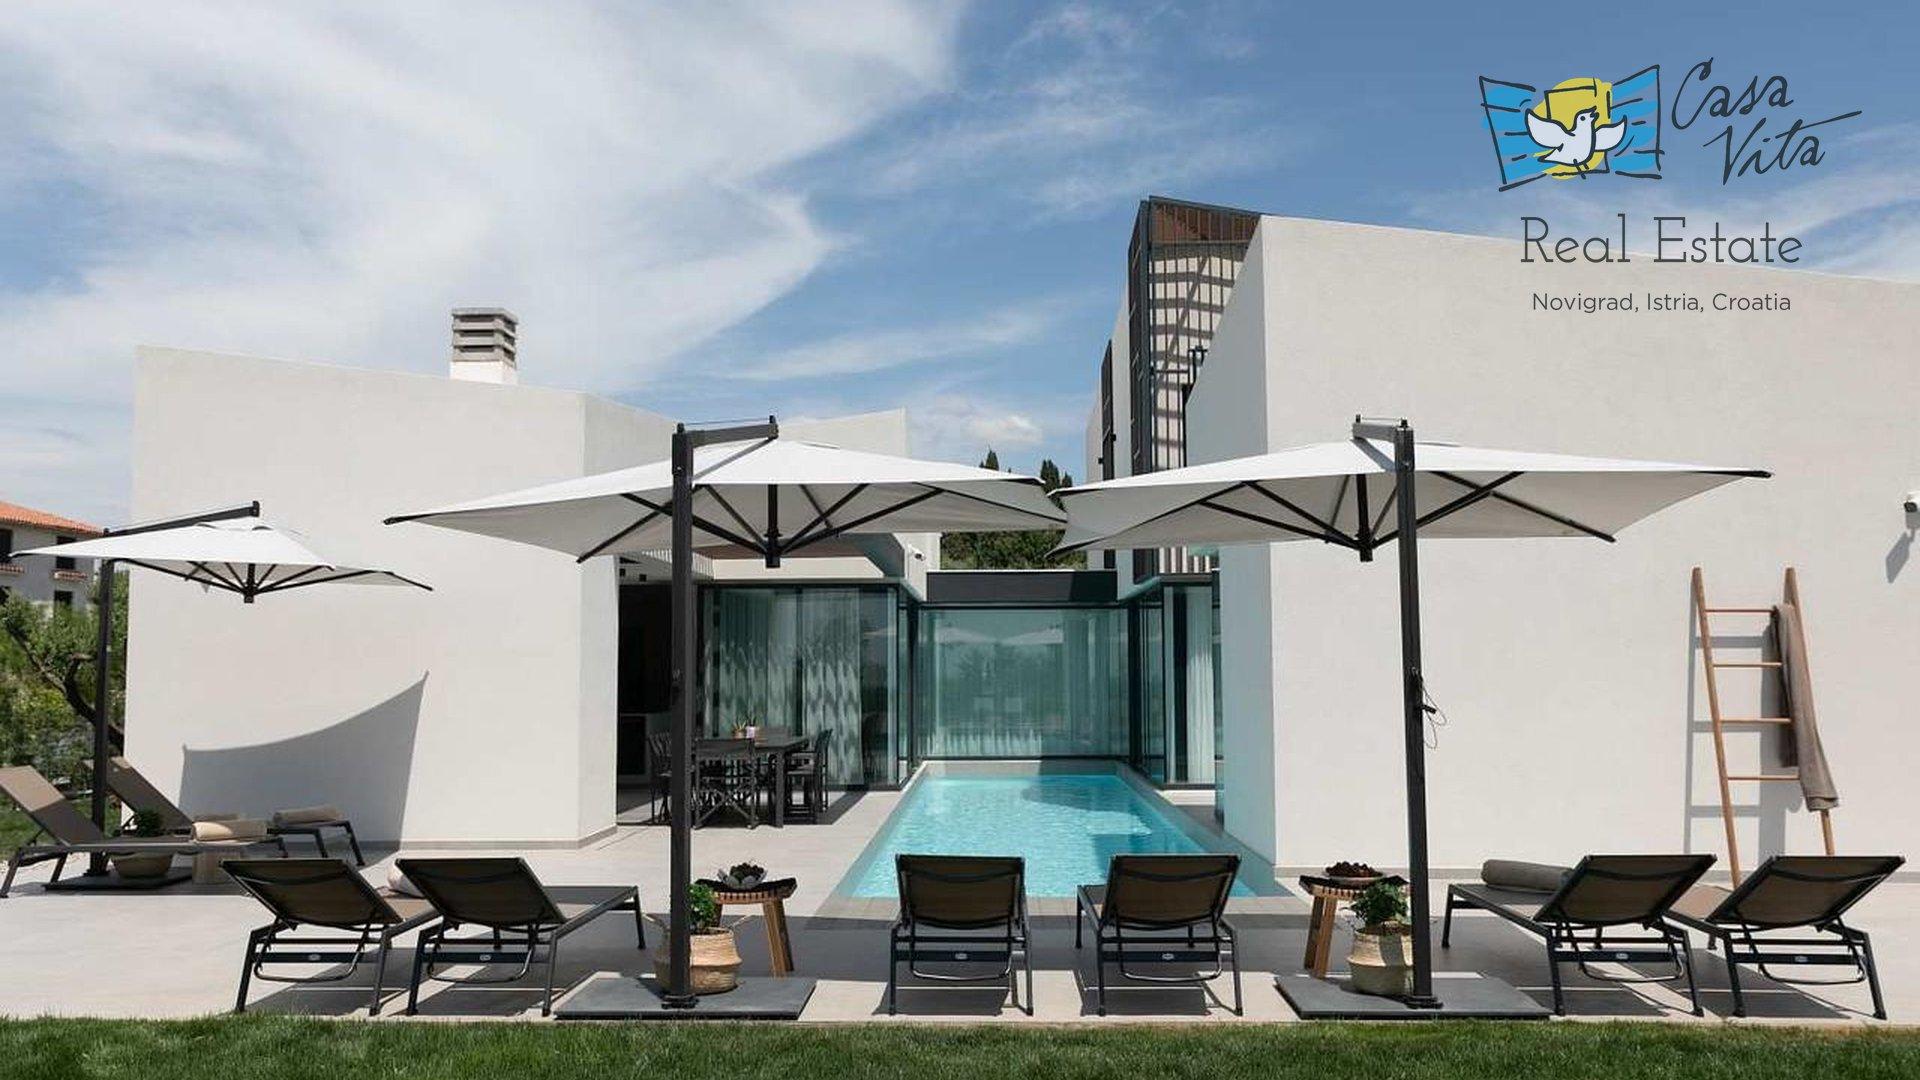 Luksuzna i moderna vila 8 km od mora!